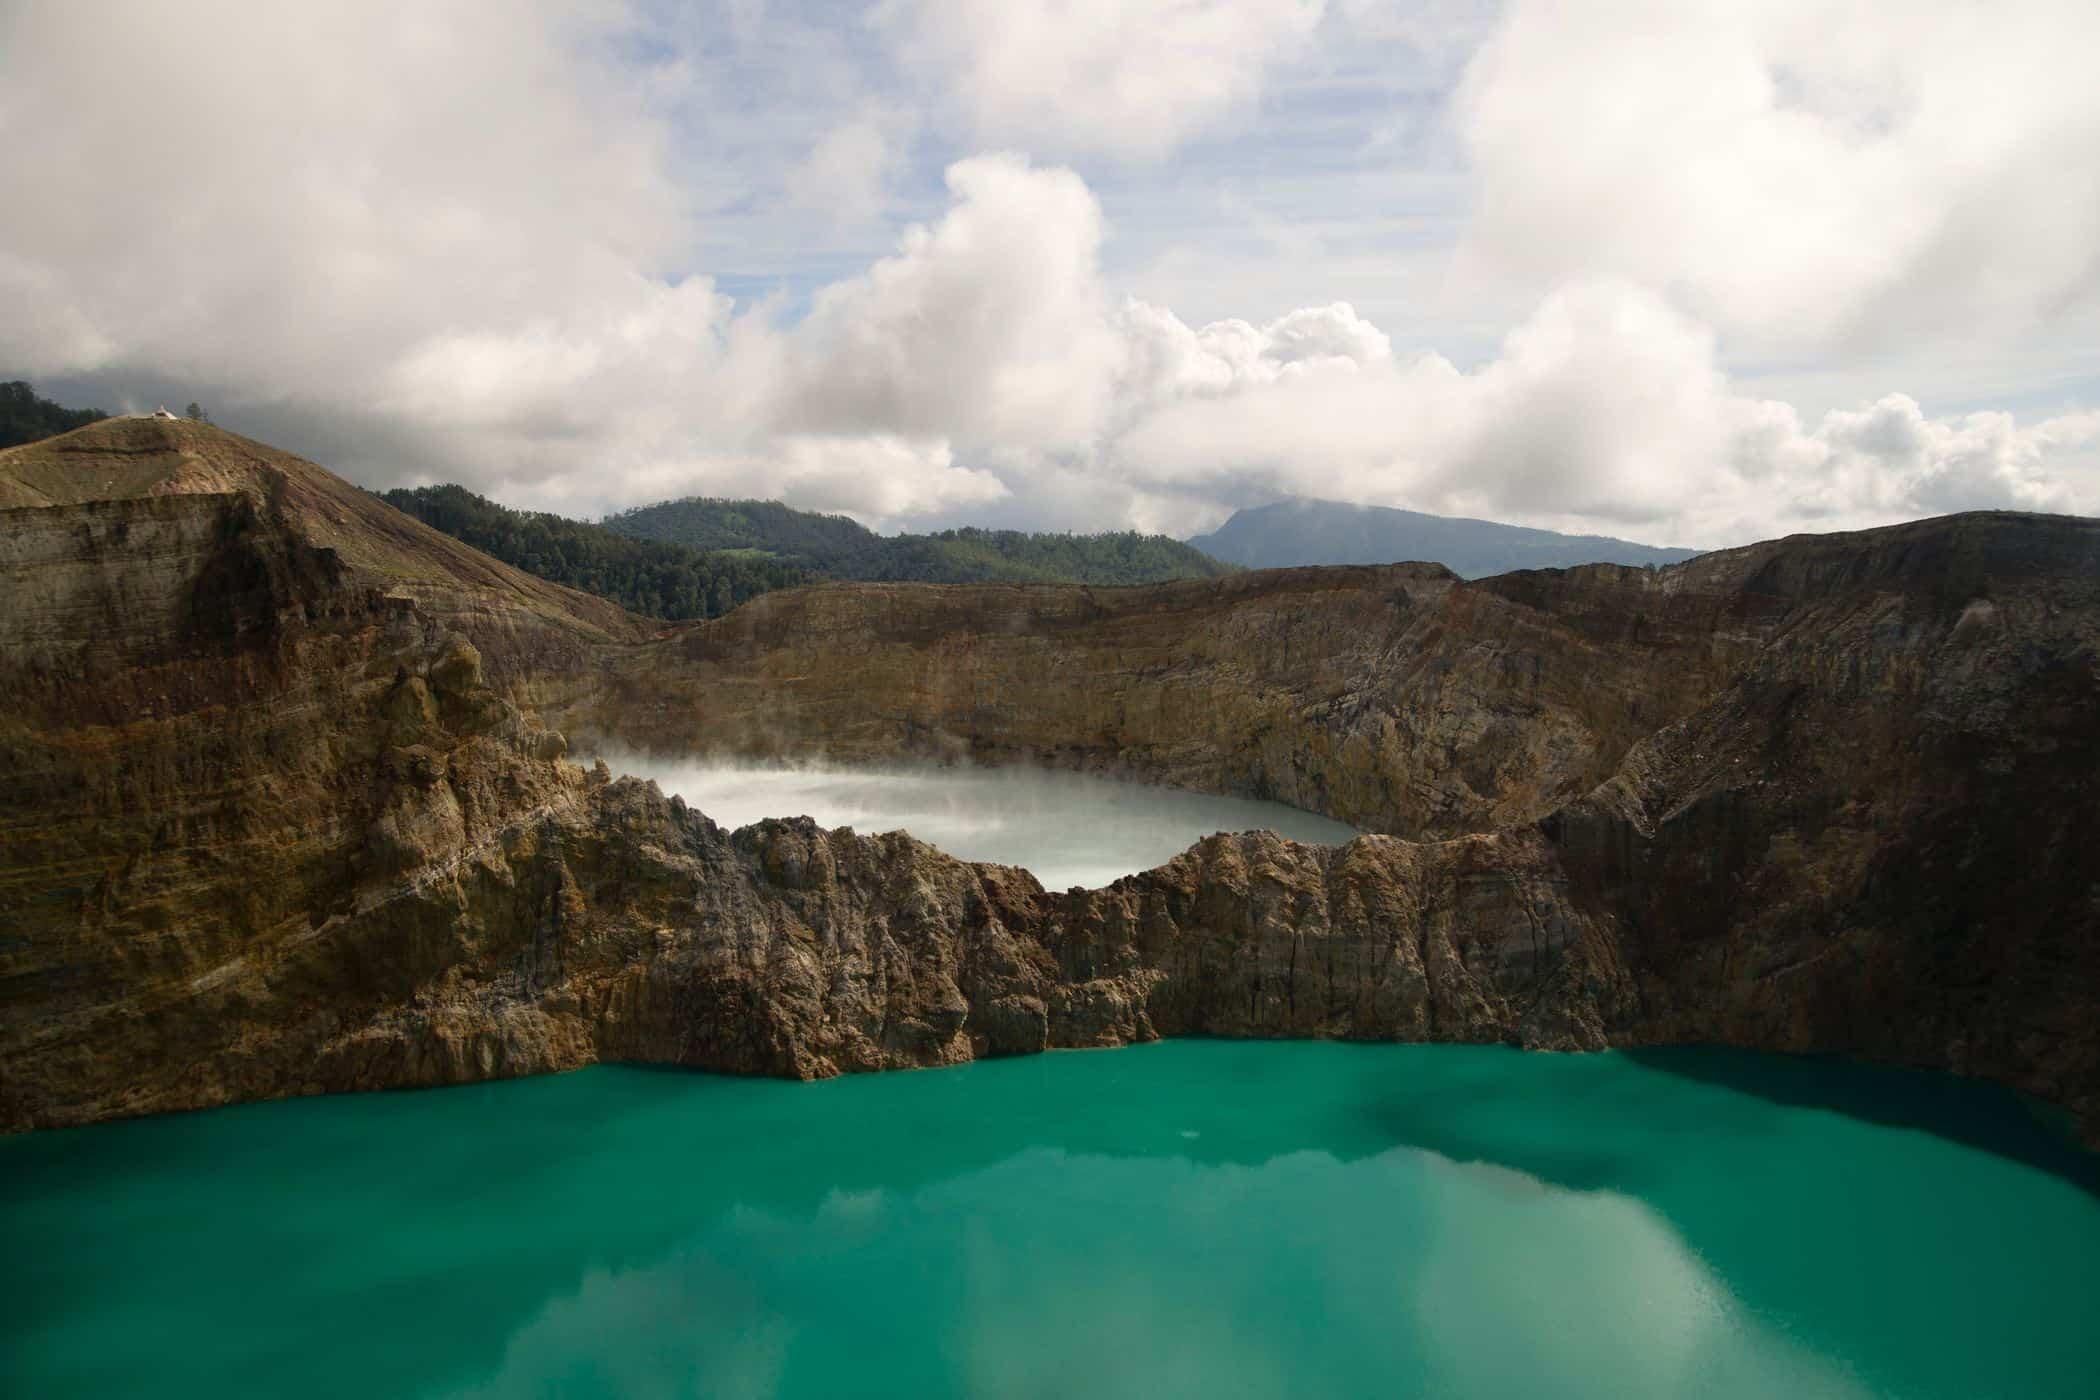 The View Across Kelimutu, Indonesia